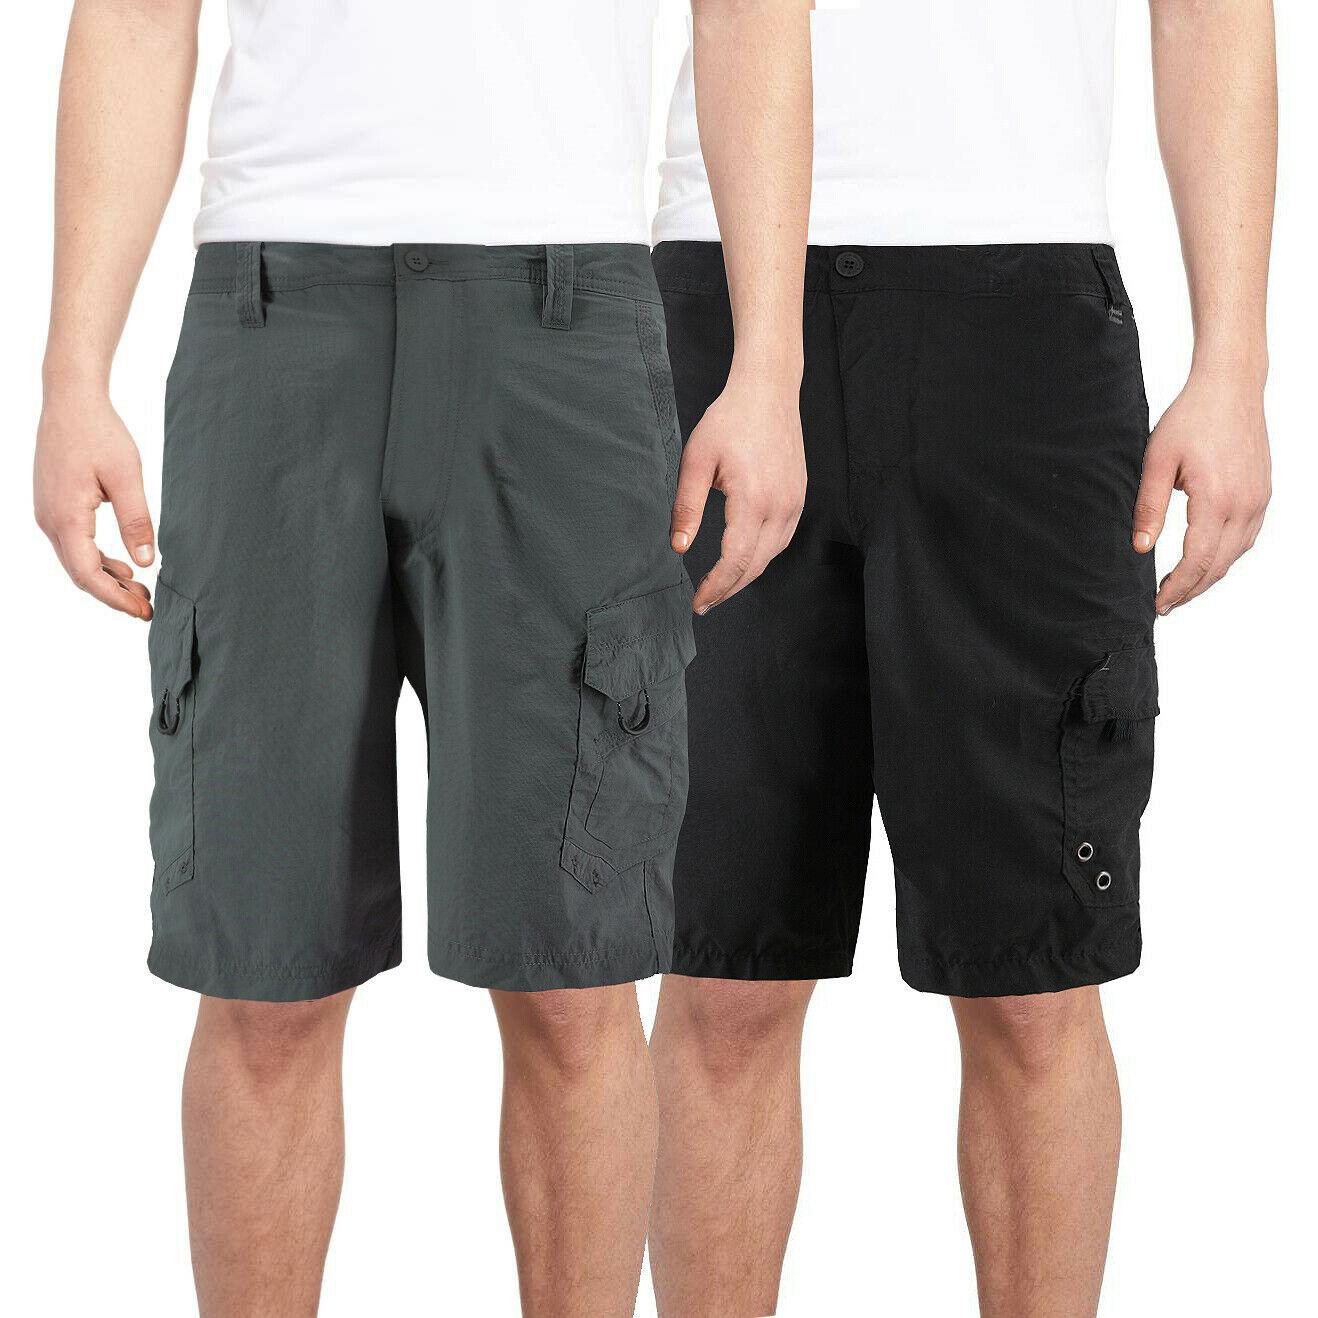 Men's Slim Fit Quick Dry Trunks Summer Surf Beach Cargo Swim Board Shorts